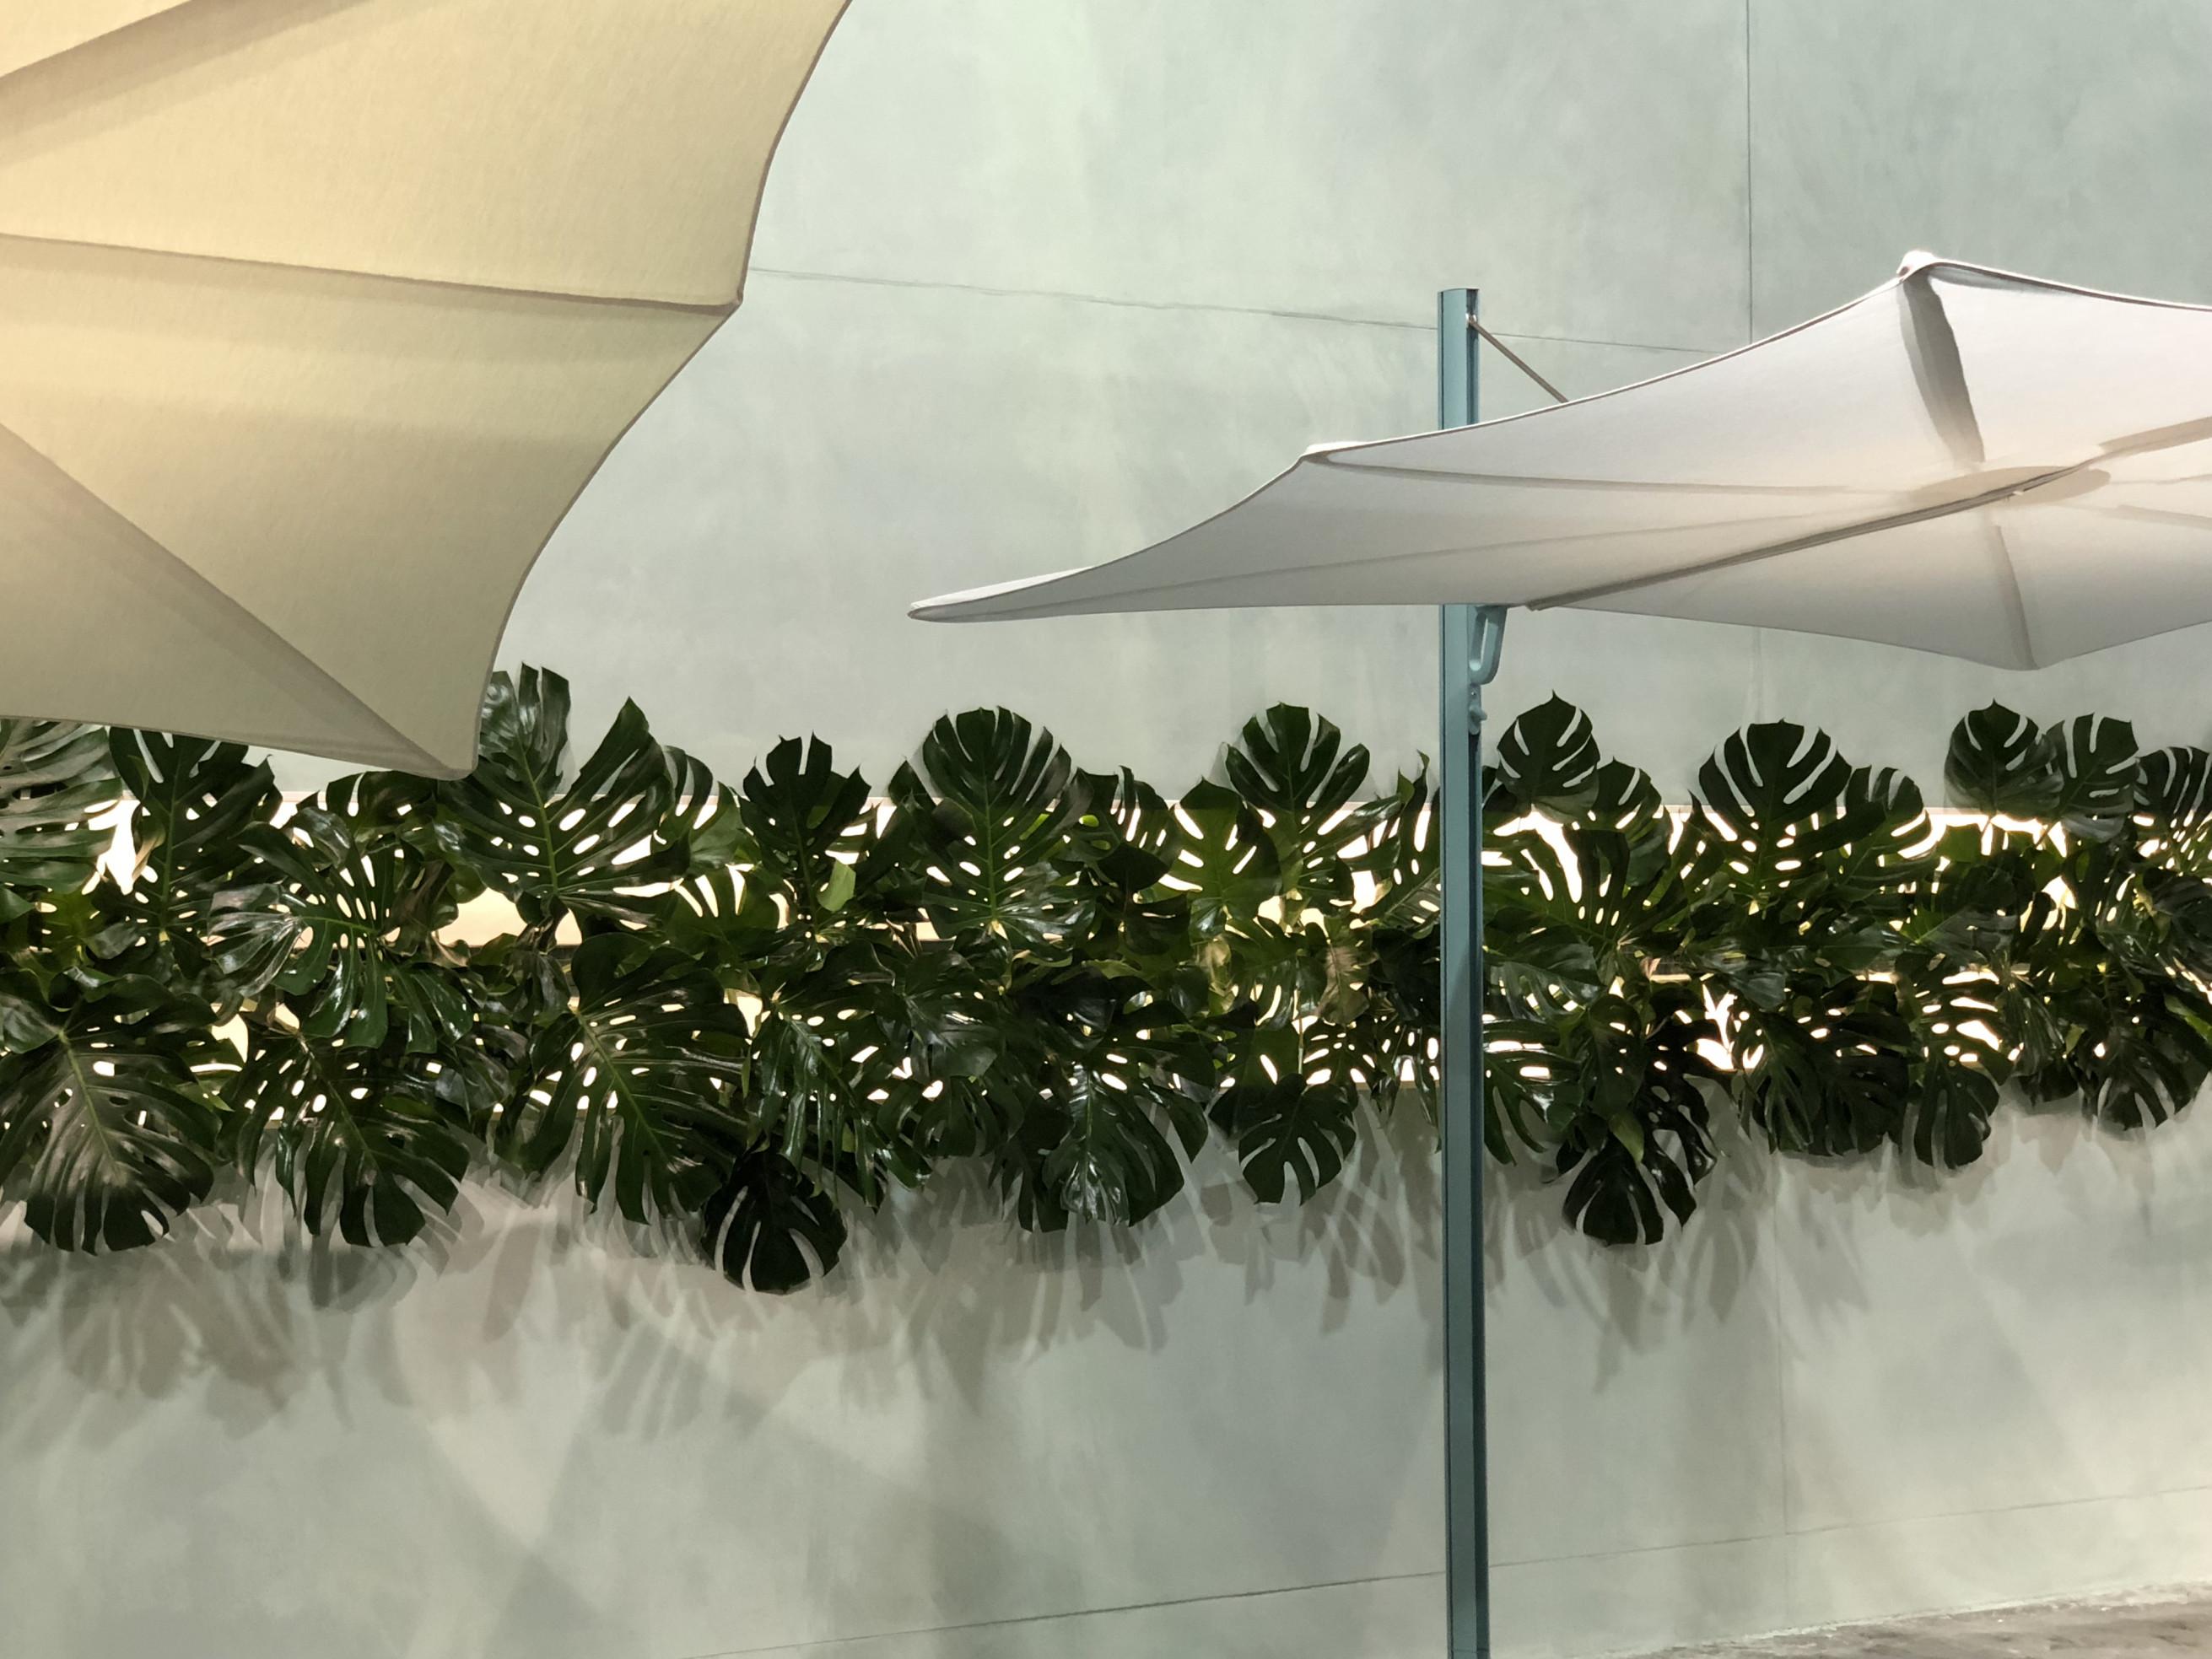 Umbrosa parasols Interieur17.jpg